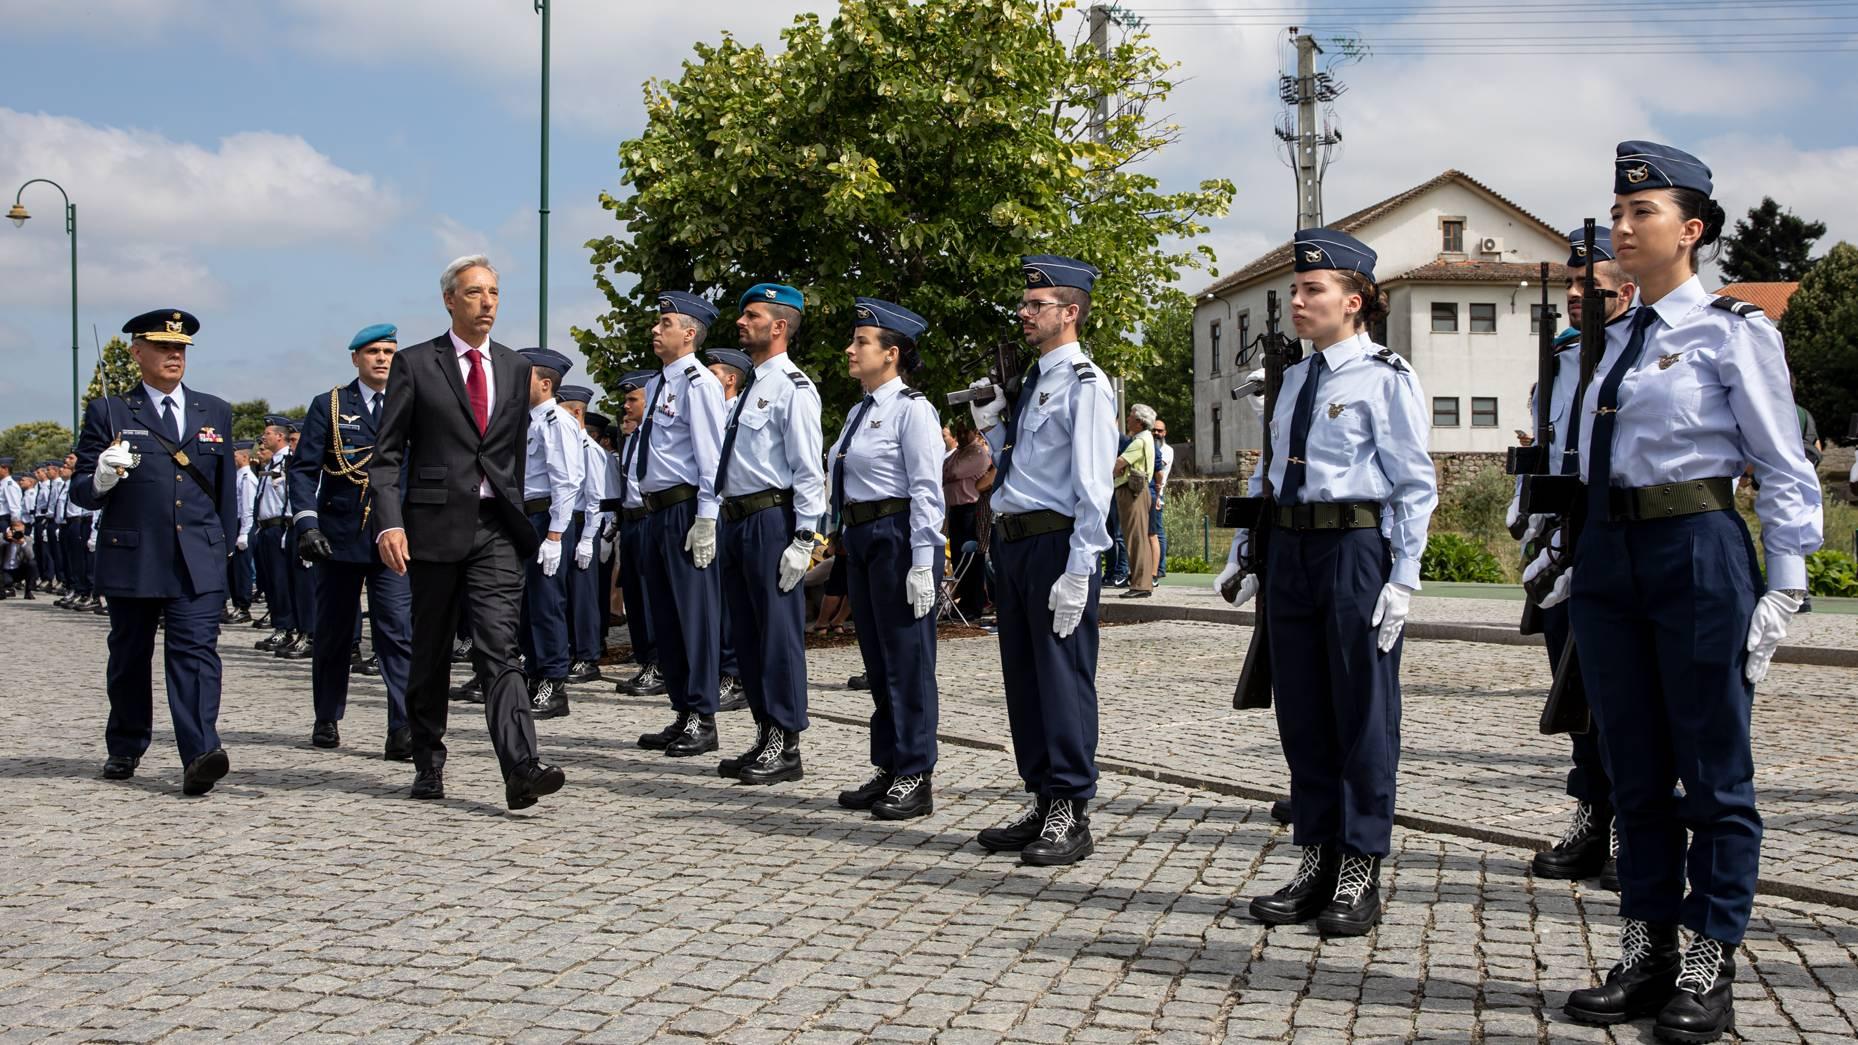 Ministro da Defesa preside Cerimónia Militar